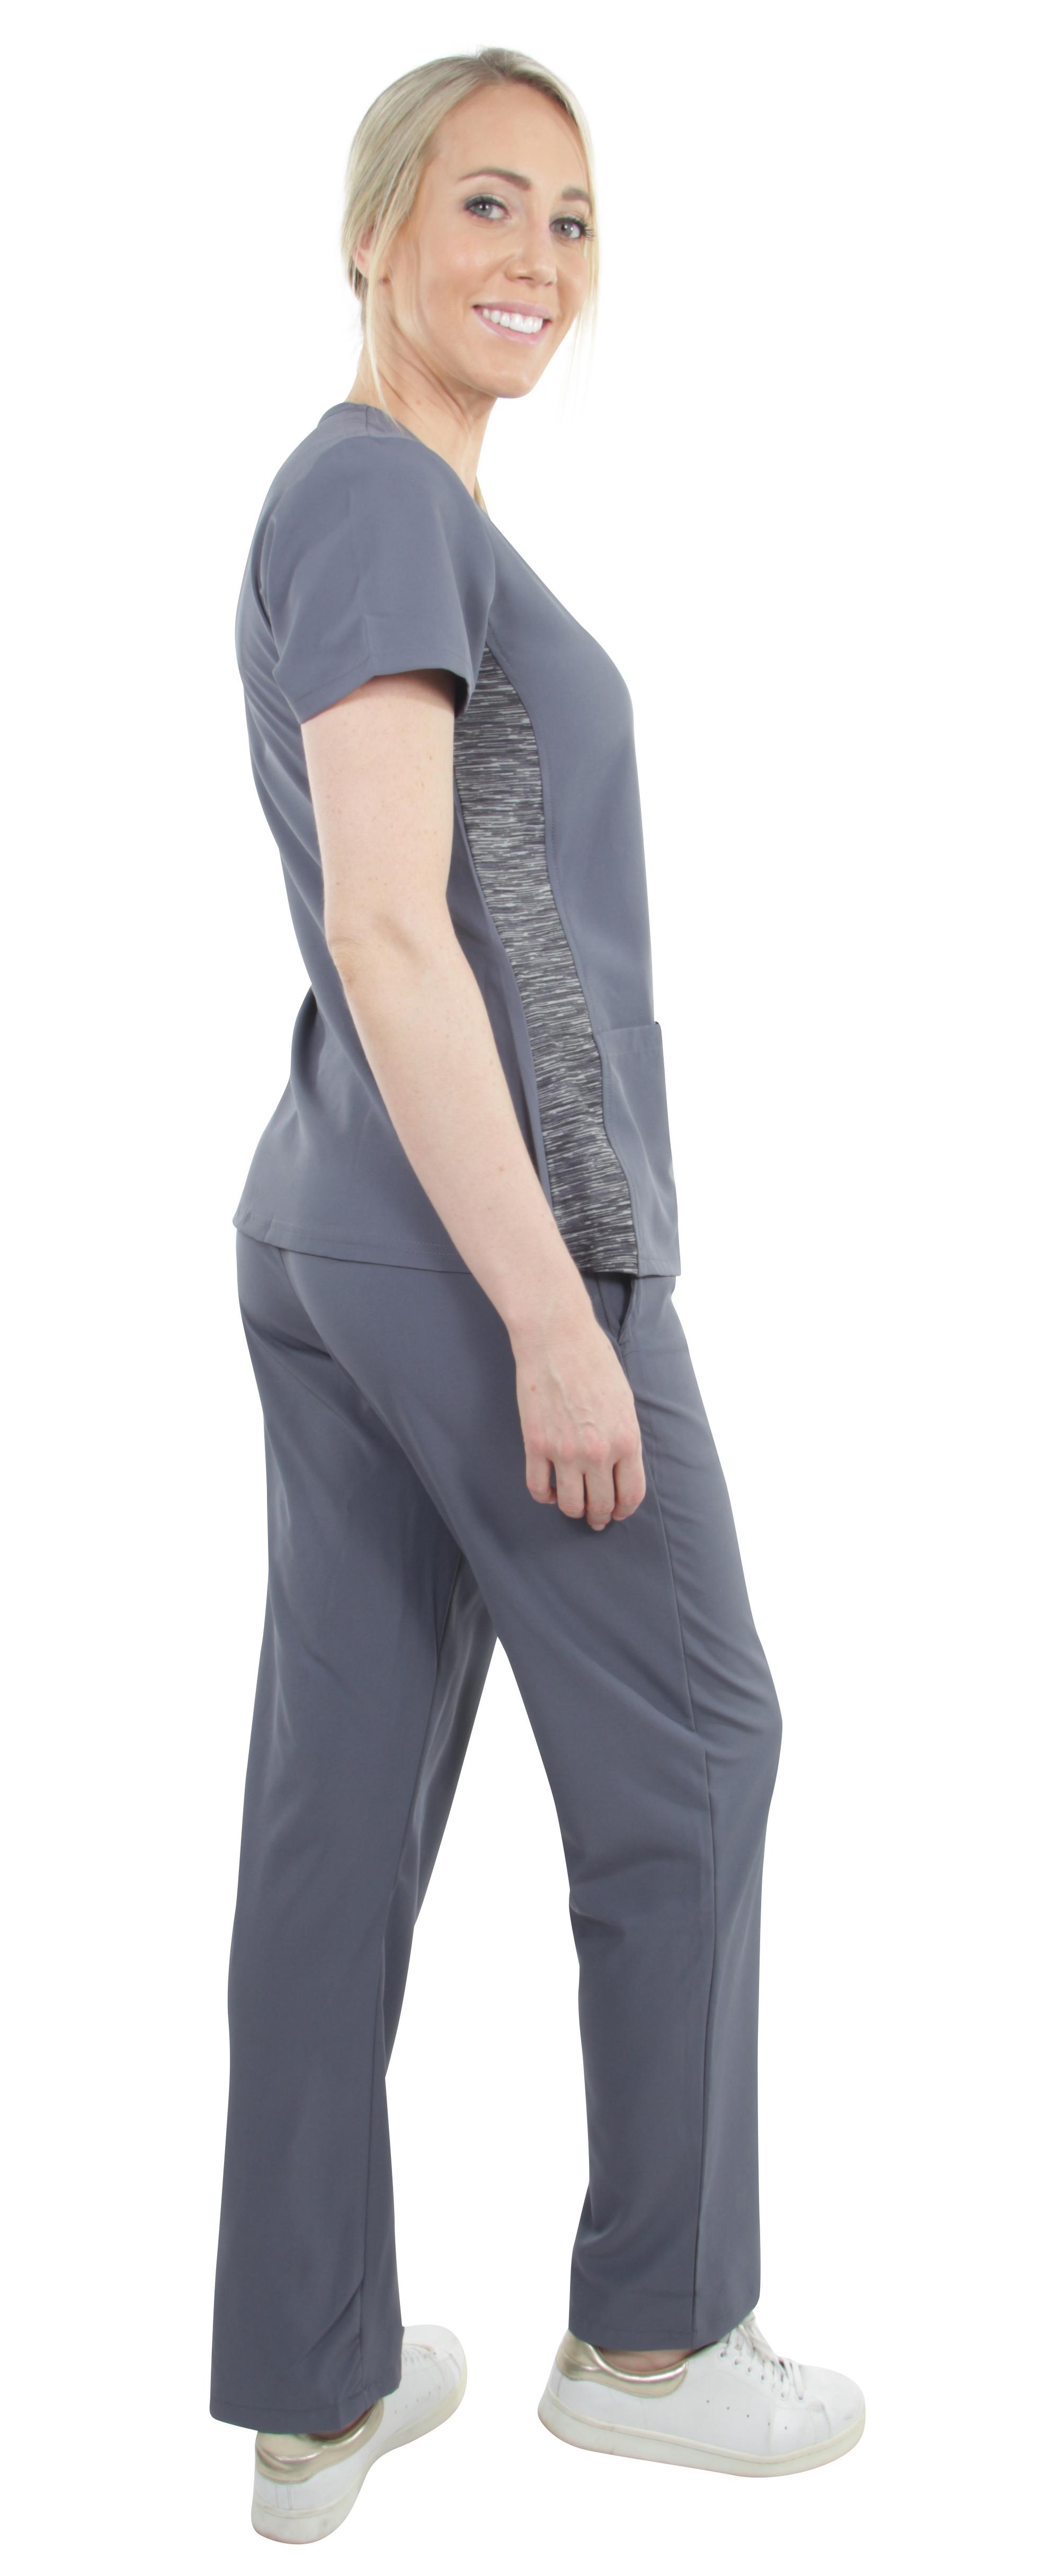 Unisex-Performance-Stretch-Medical-Uniform-Five-Pockets-V-Neck-Scrubs-Sets miniature 25